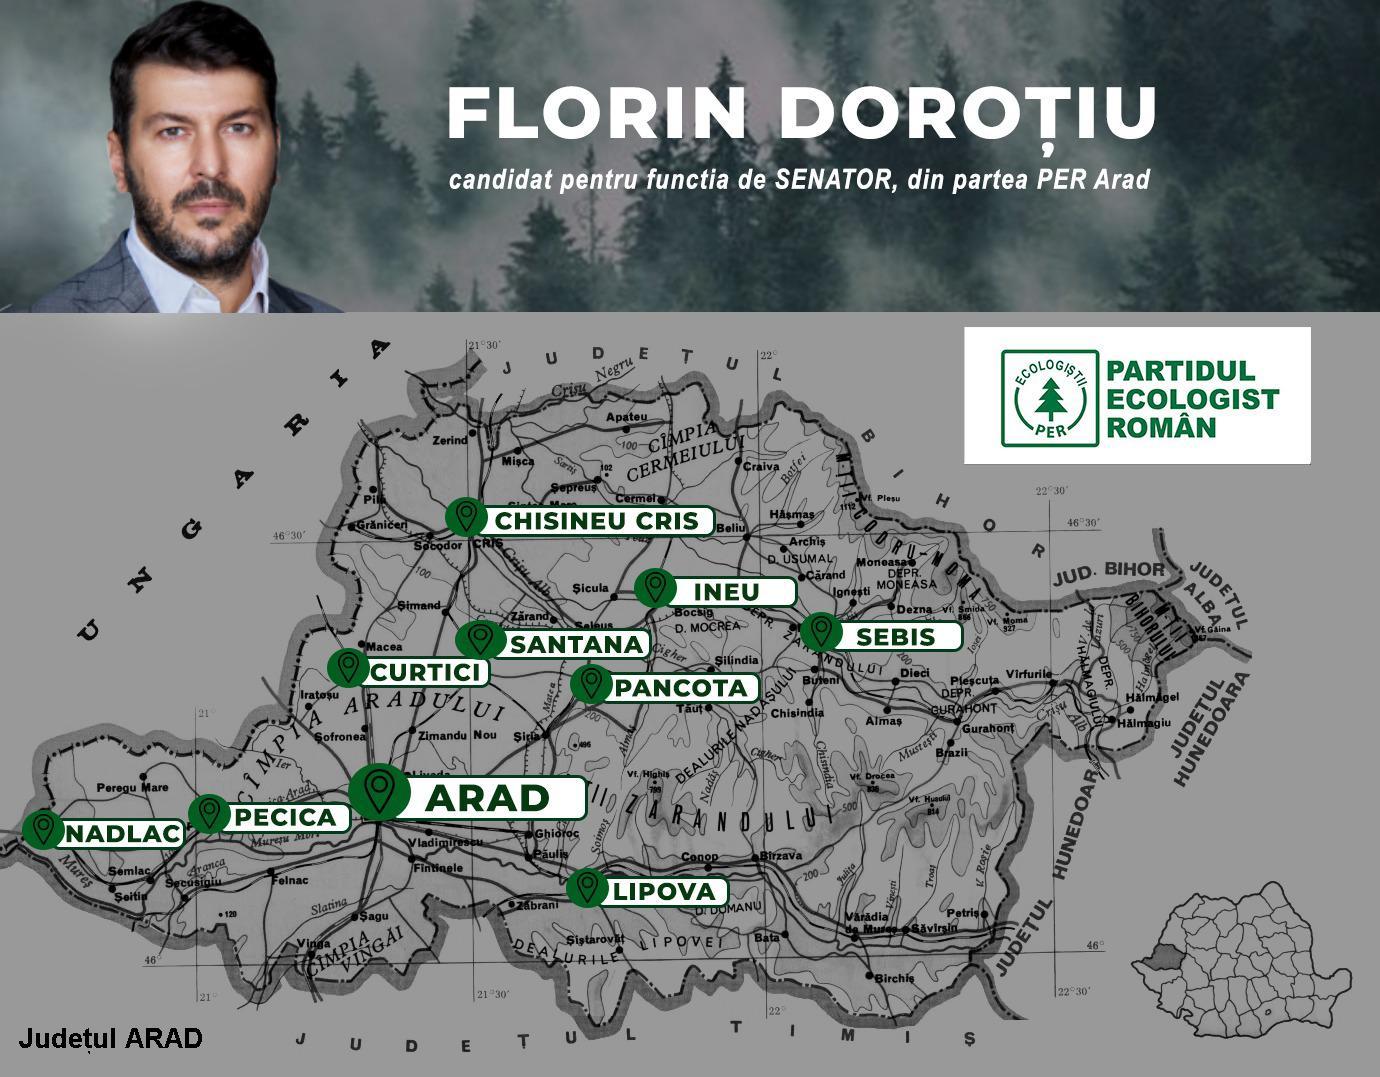 Florin Dorotiu